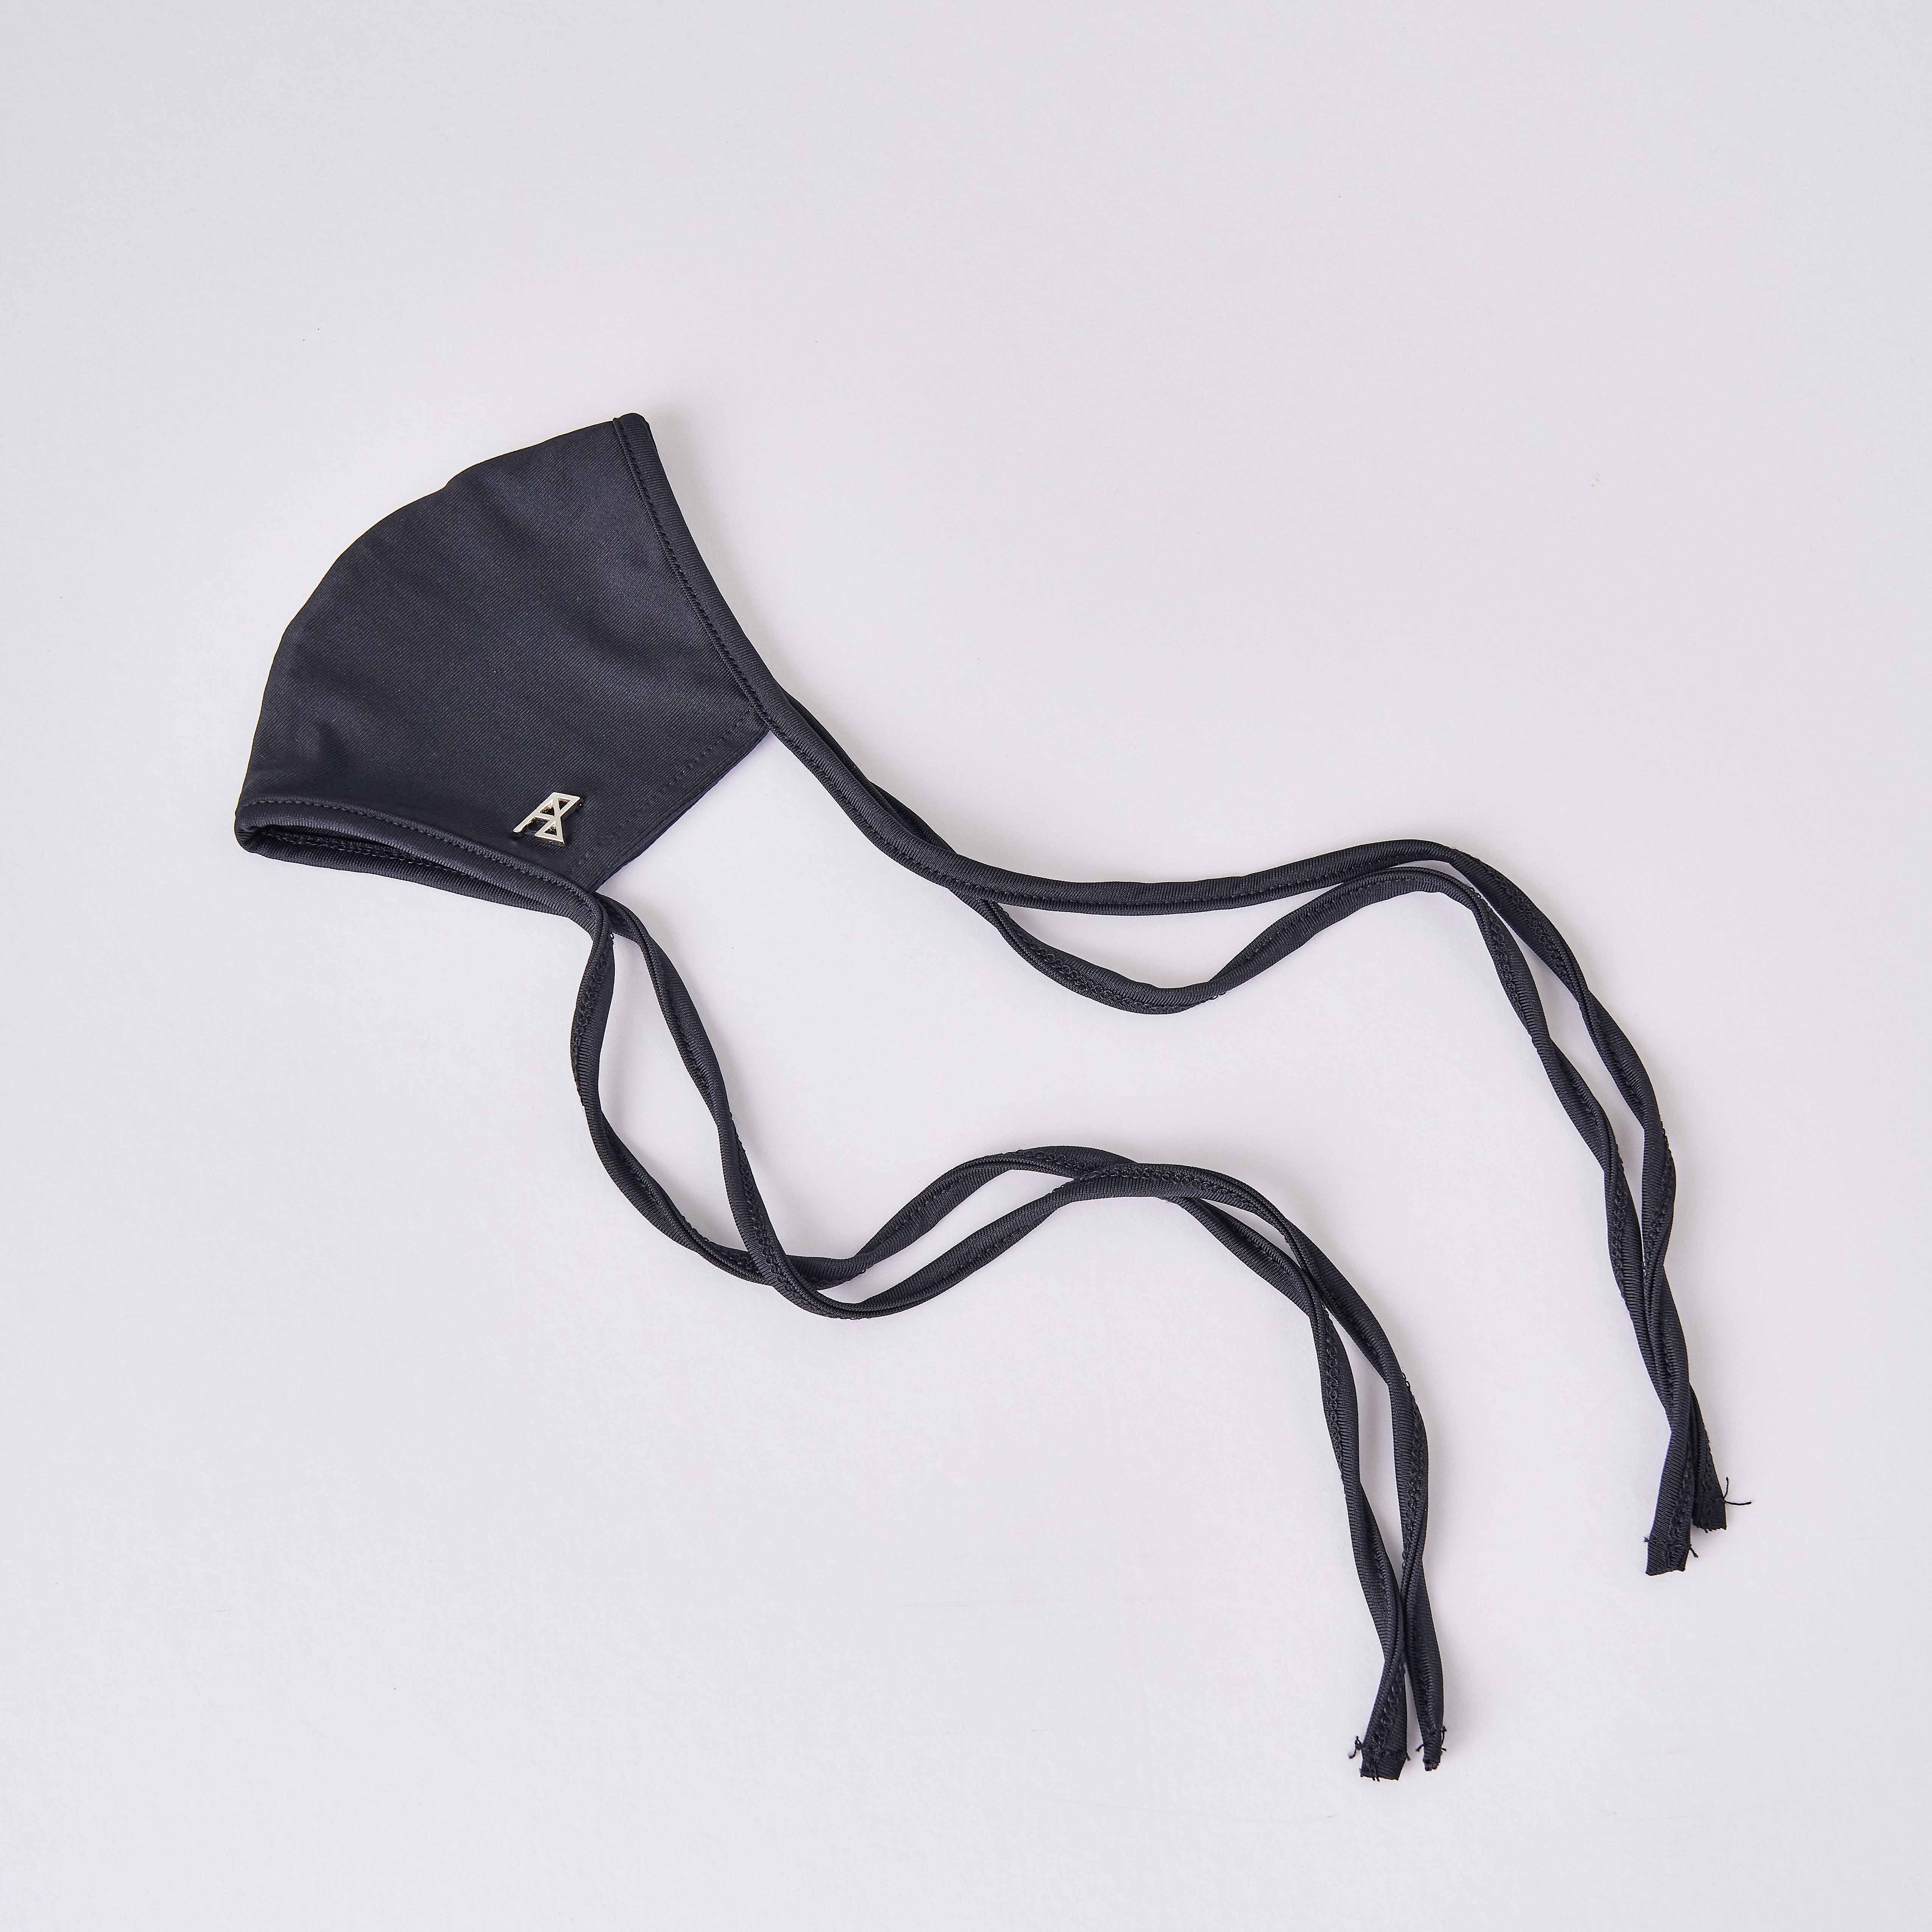 AZ Mask Double Tie-on Strap